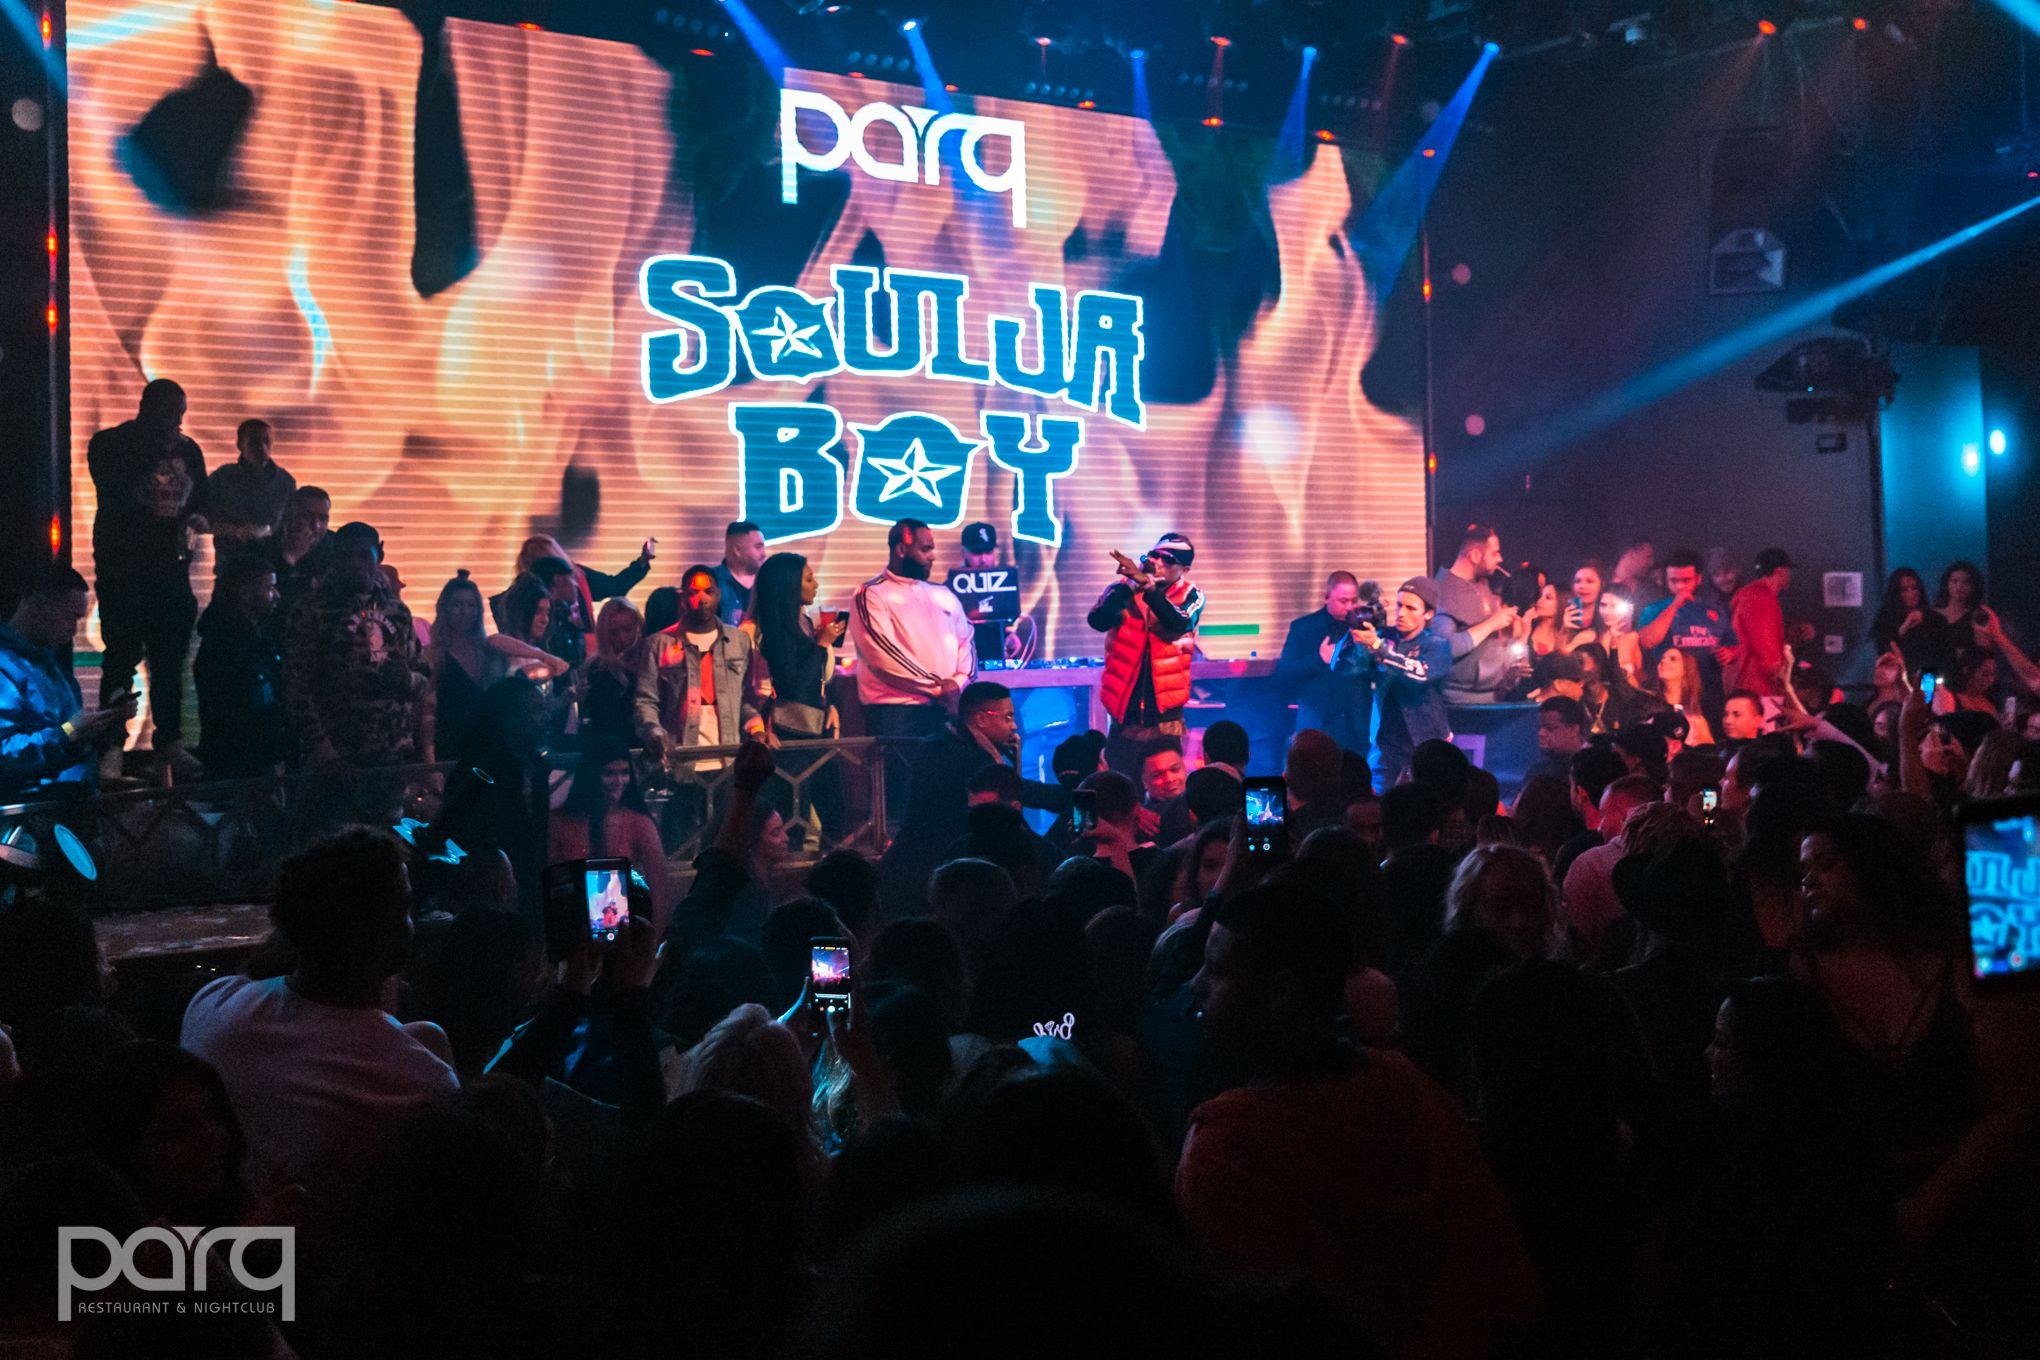 02.08.19 Parq - Soulja Boy-8.jpg